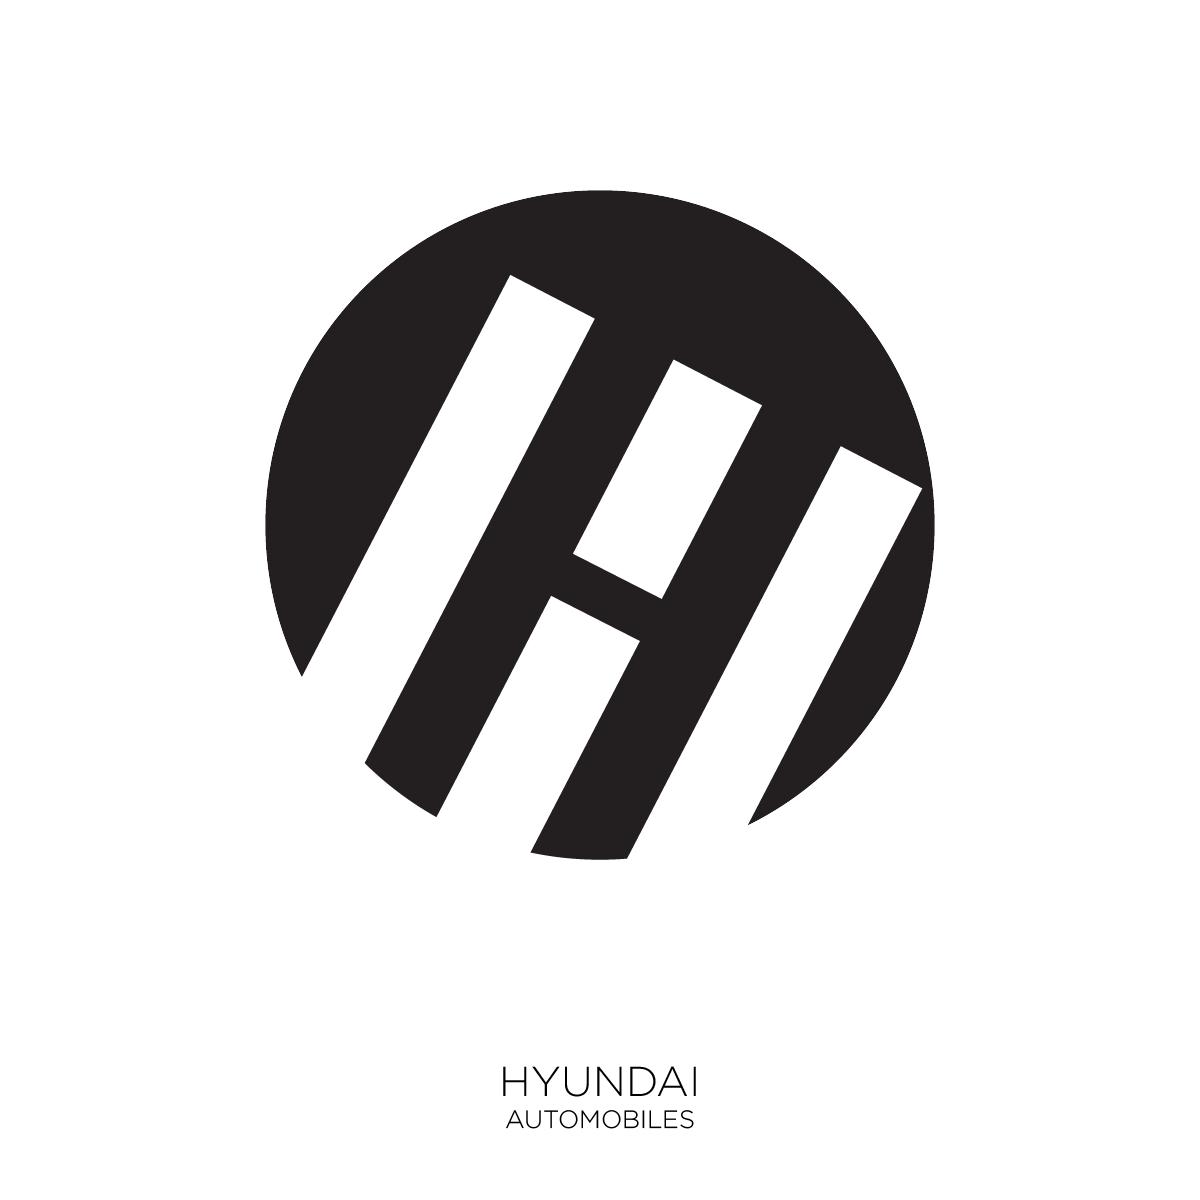 Hyundai logo-01.png